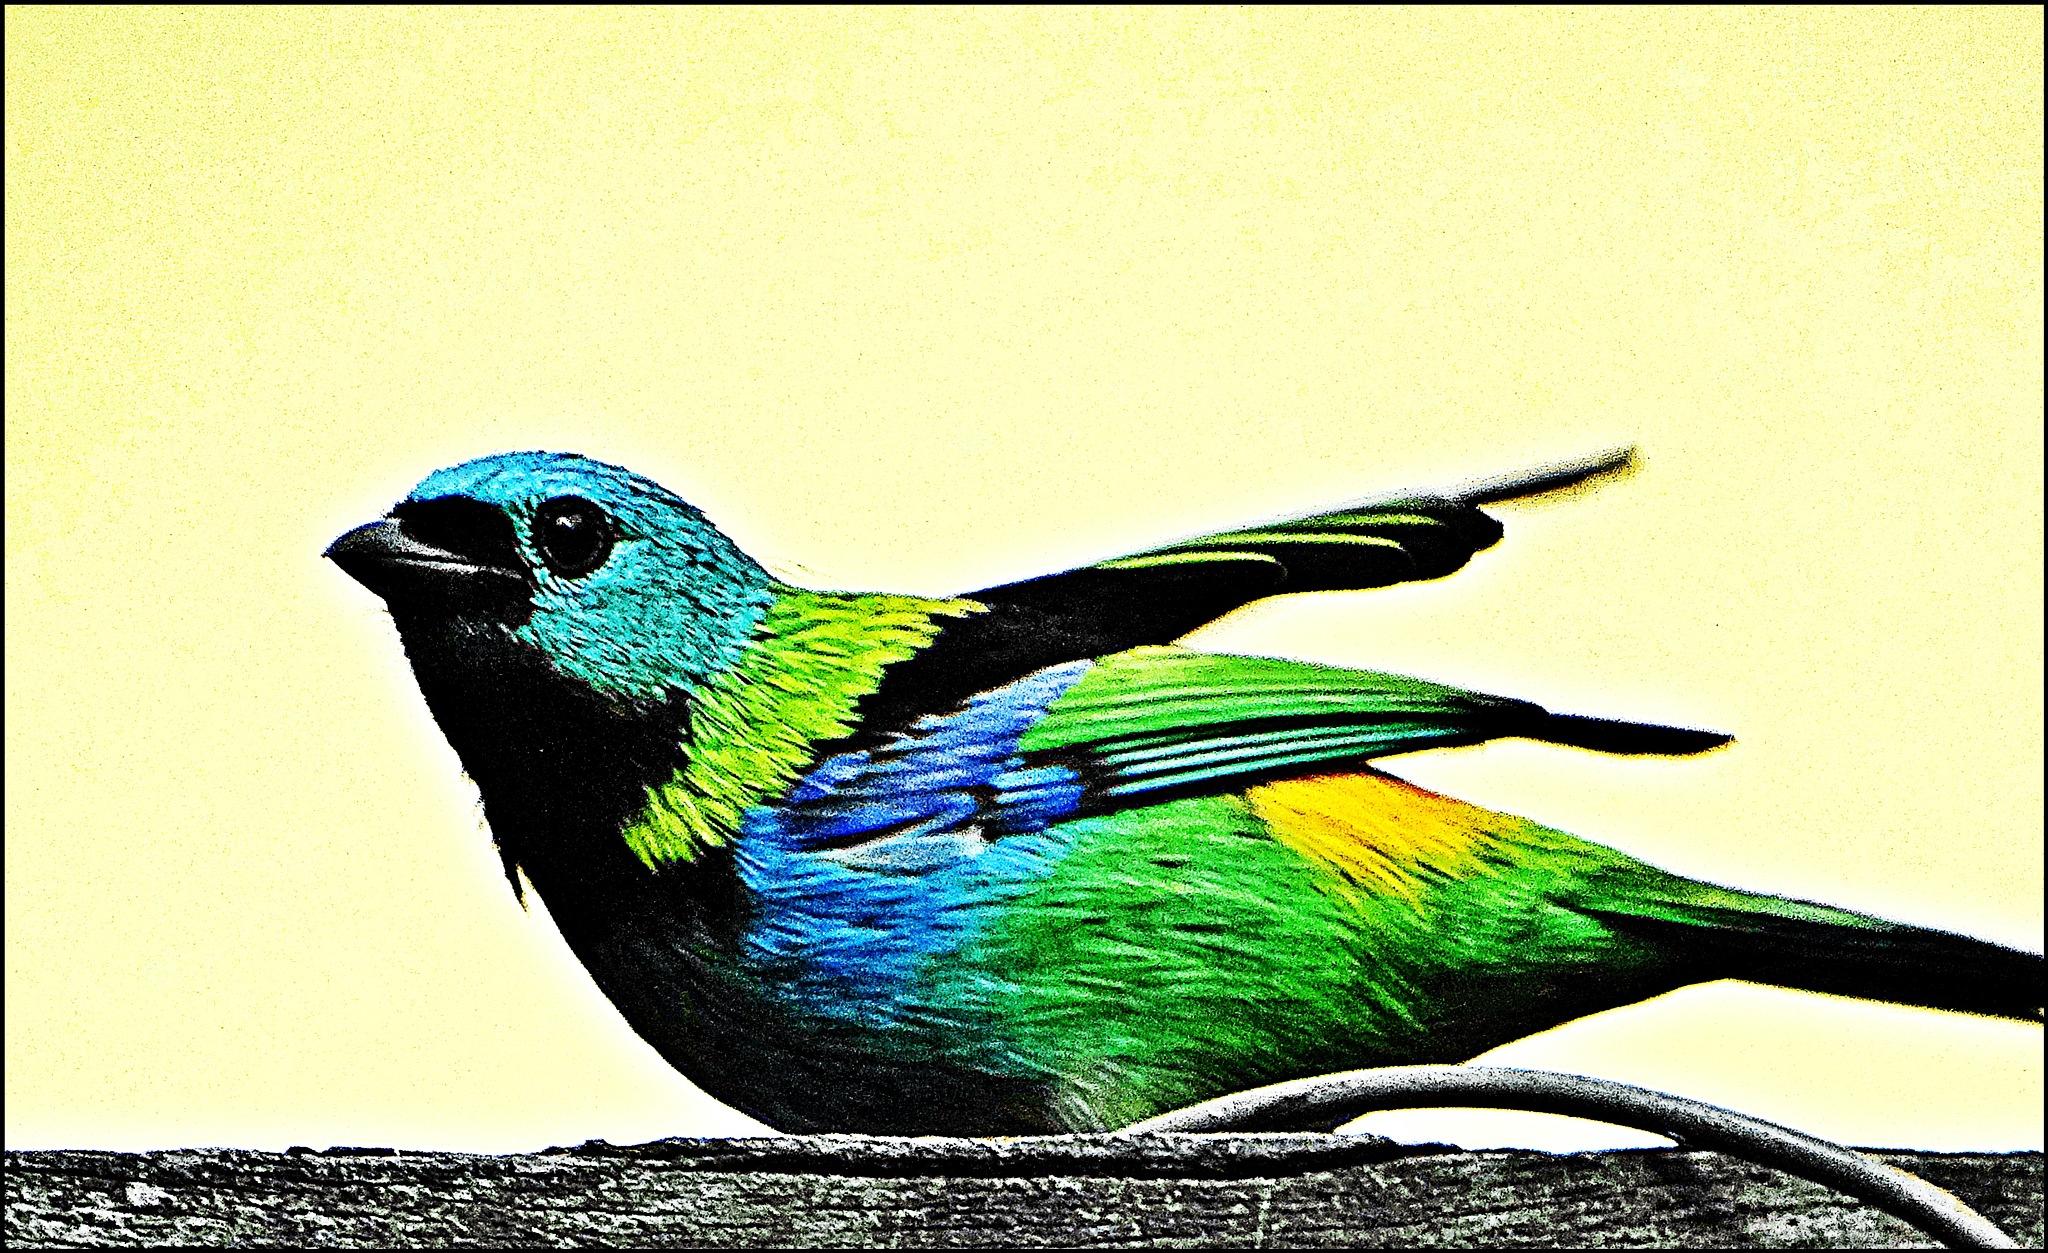 Saíra-sete-cores  by Emerson Mazza